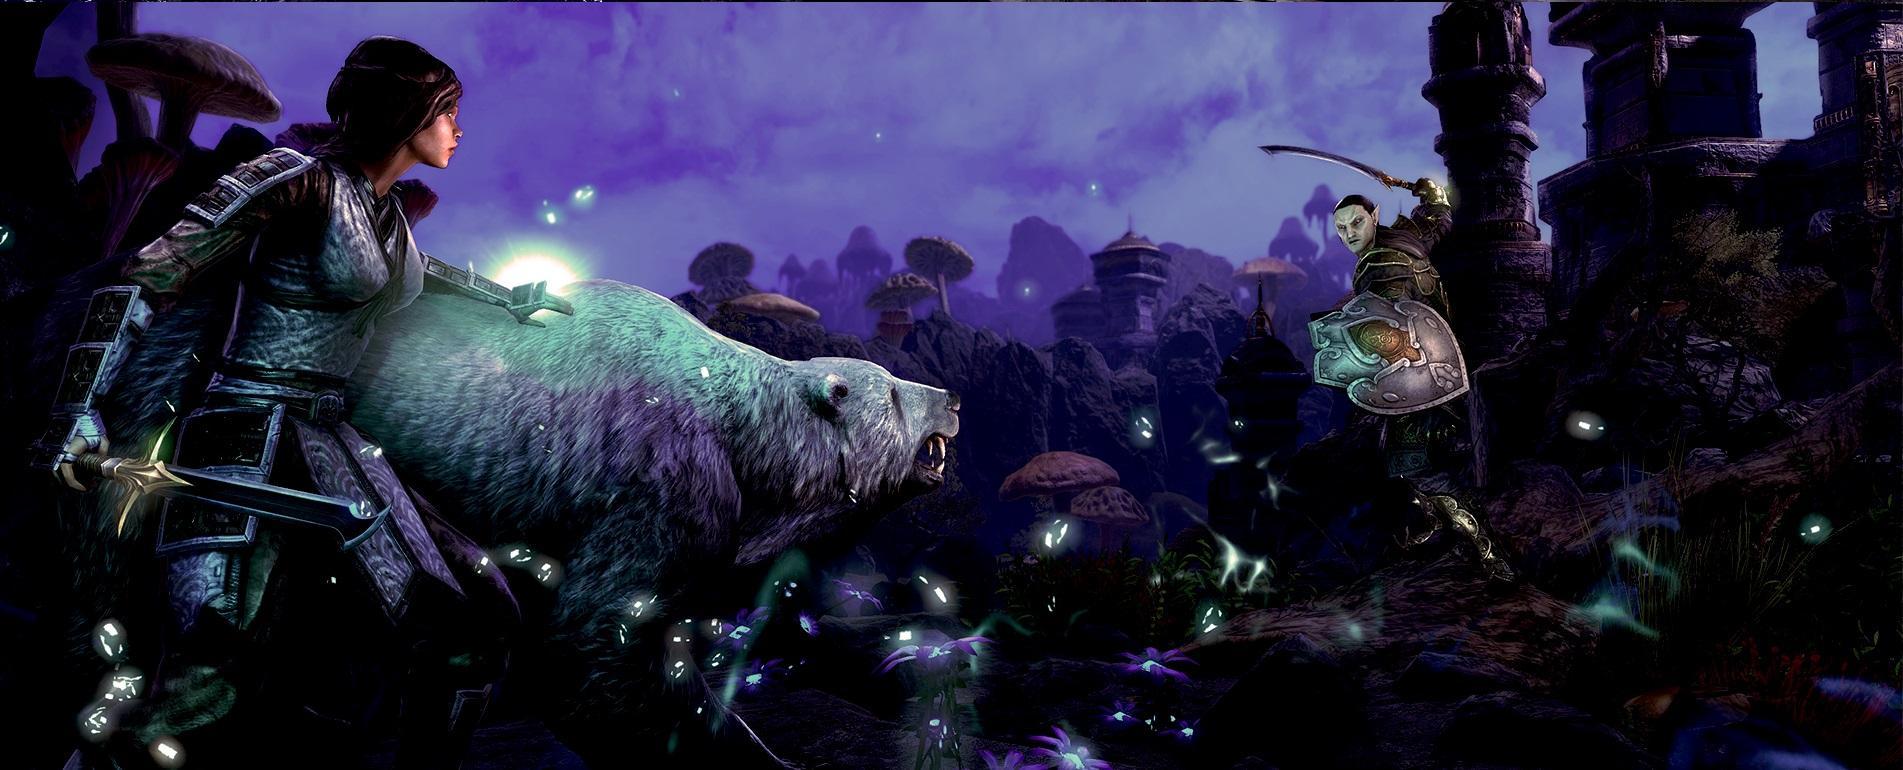 The Elder Scrolls Online Morrowind Screenshot 01